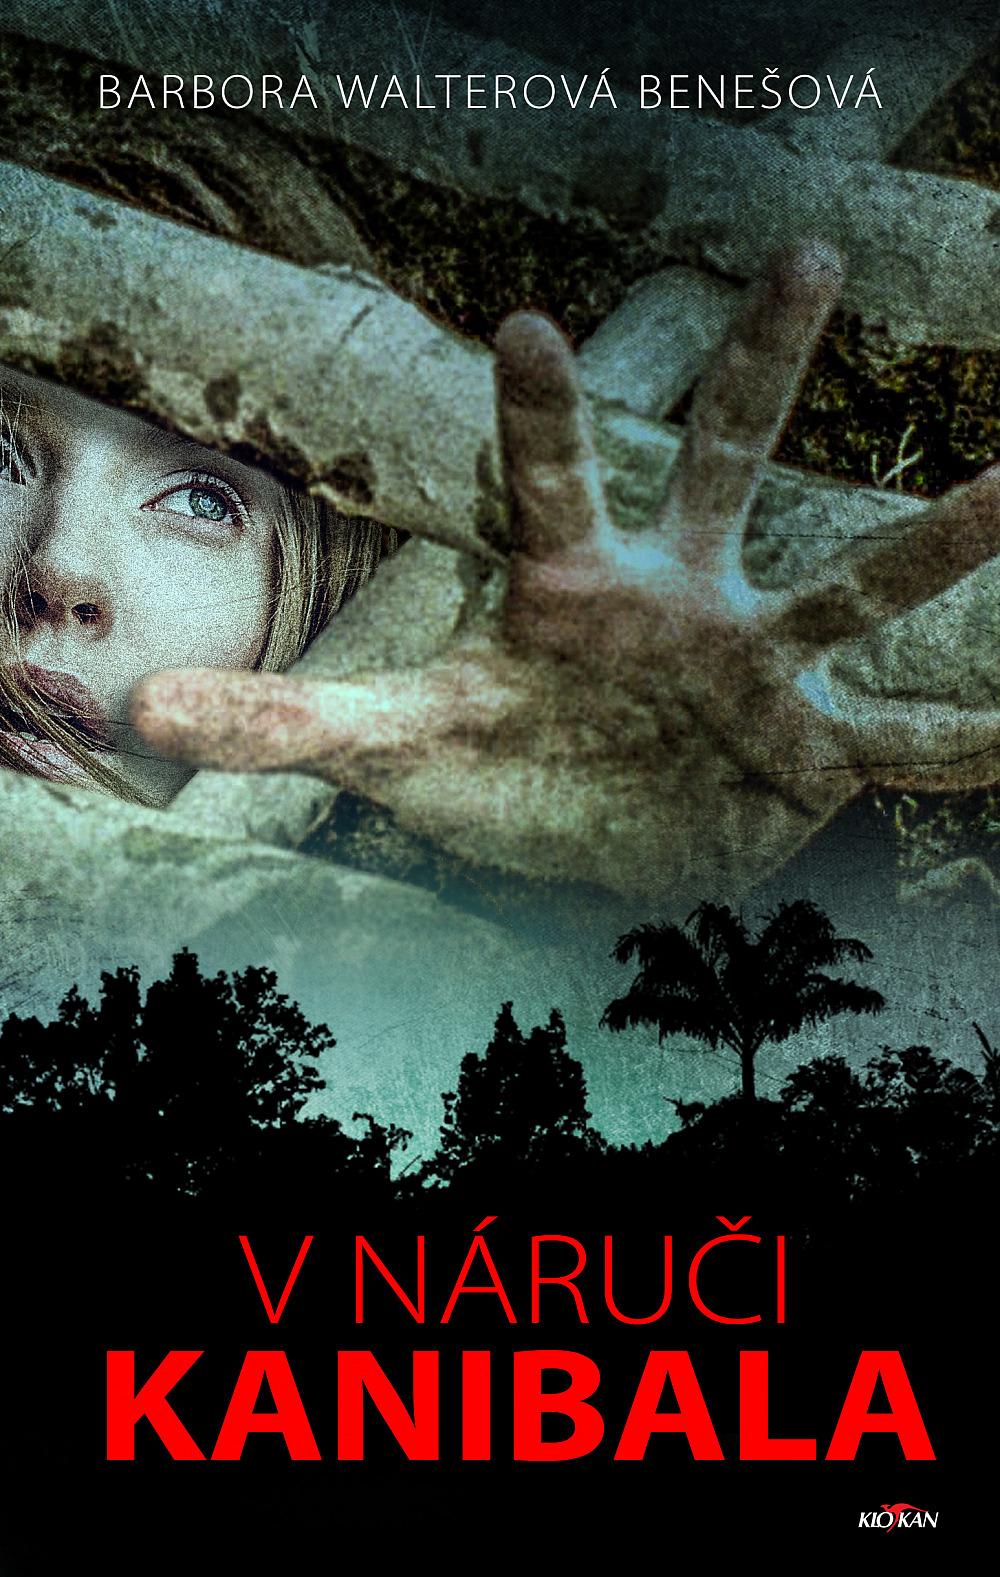 big_v-naruci-kanibala-try-421629